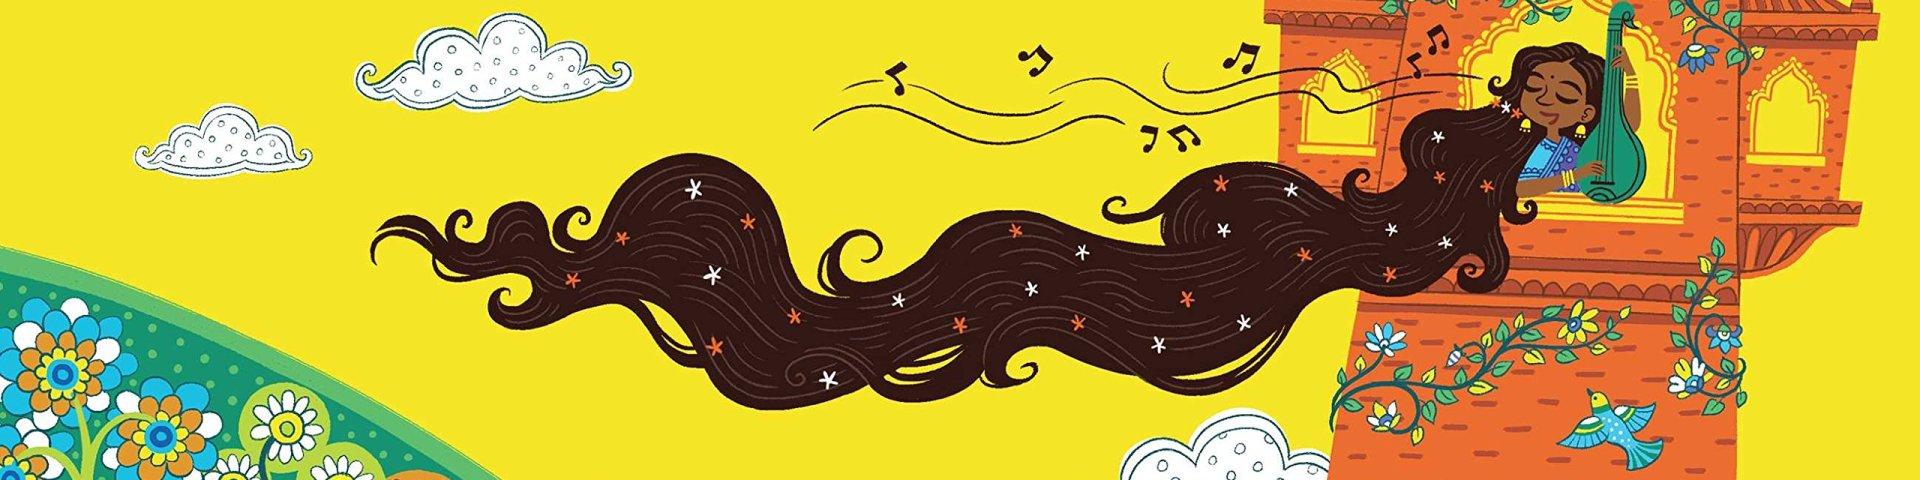 Spread of Rapunzel by Chloe Perkins